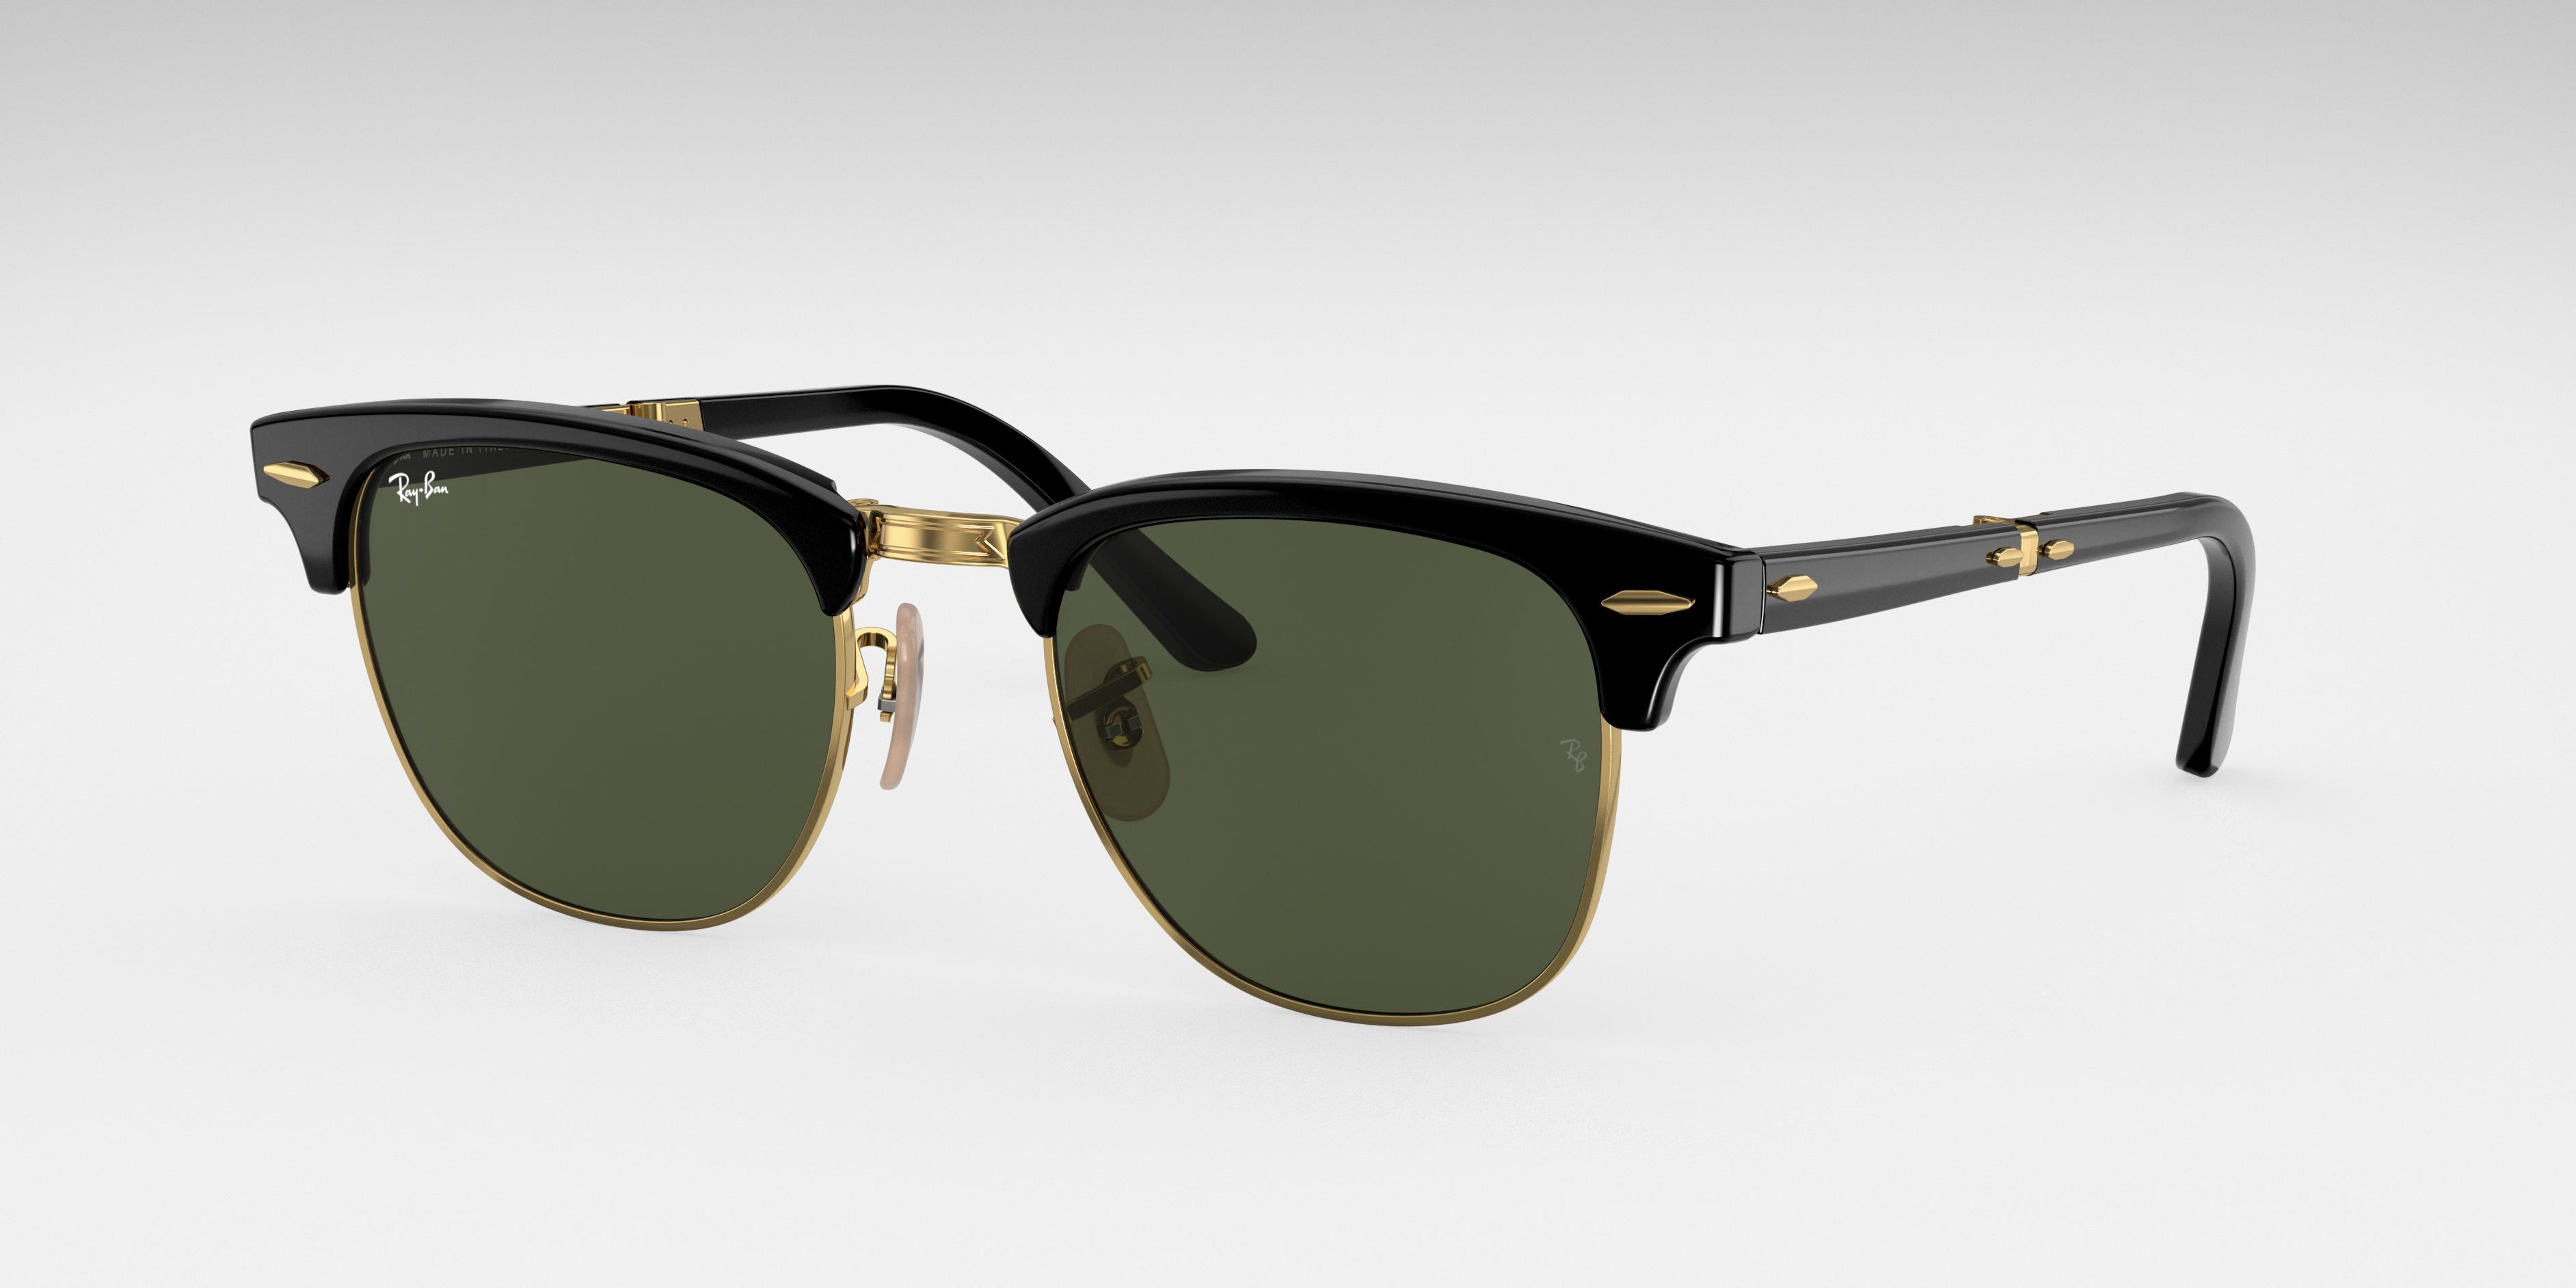 Ray-Ban Clubmaster Folding Black, Green Lenses - RB2176